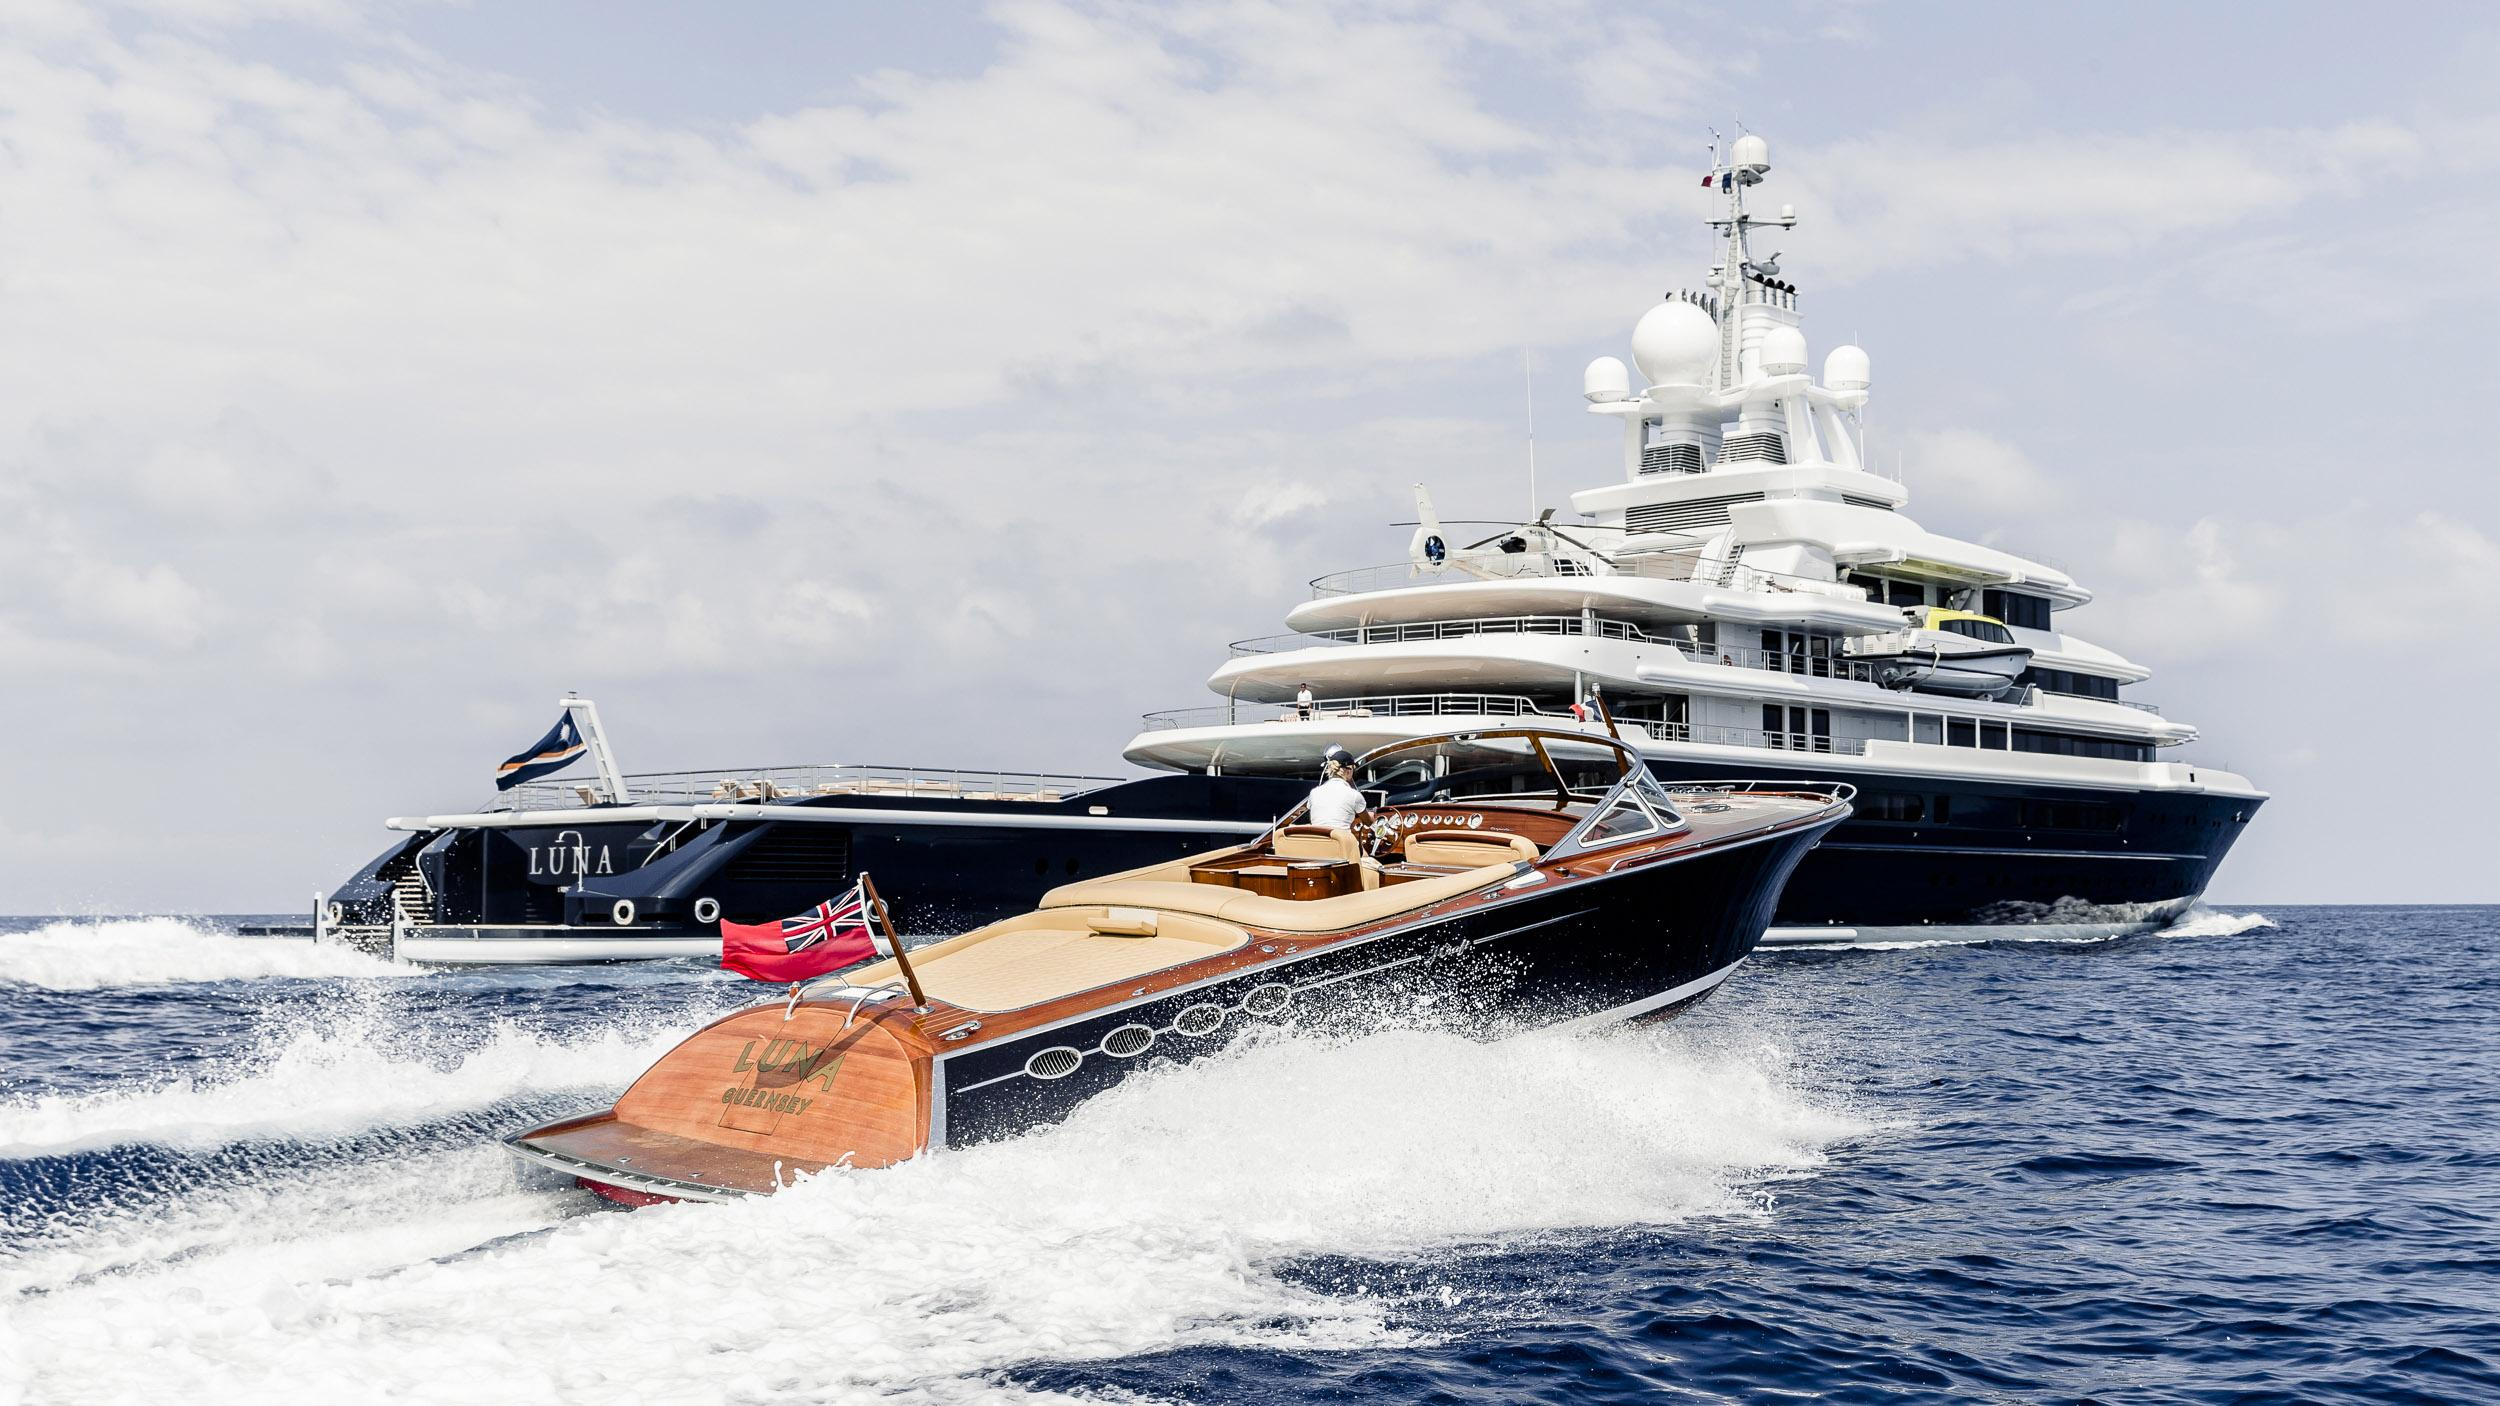 luna superyacht lloyd werft 2010 115m cruising half stern